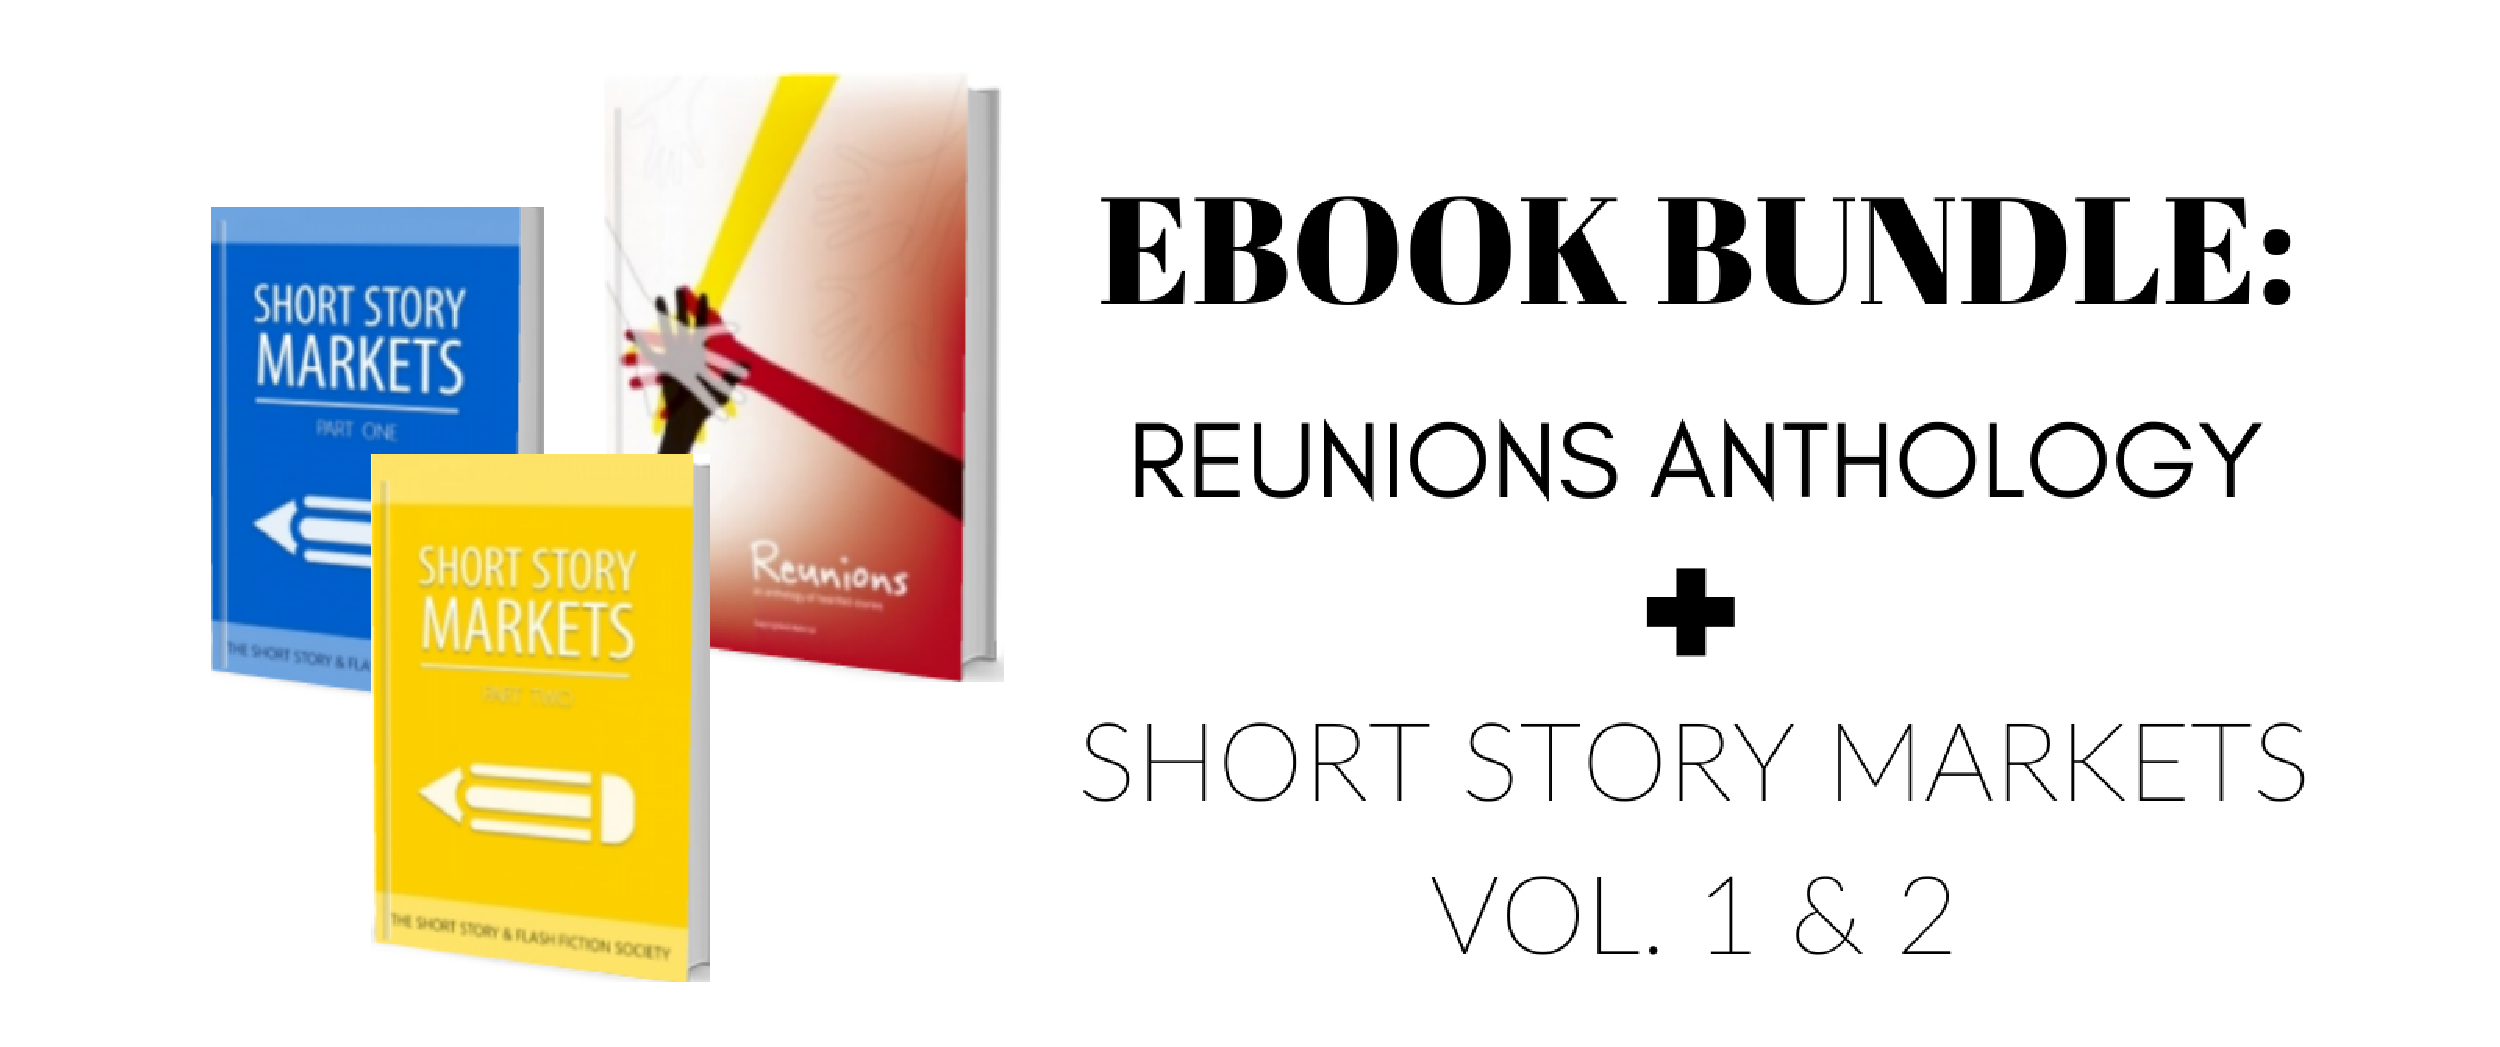 Ssffs Exclusive Three Ebook Bundle